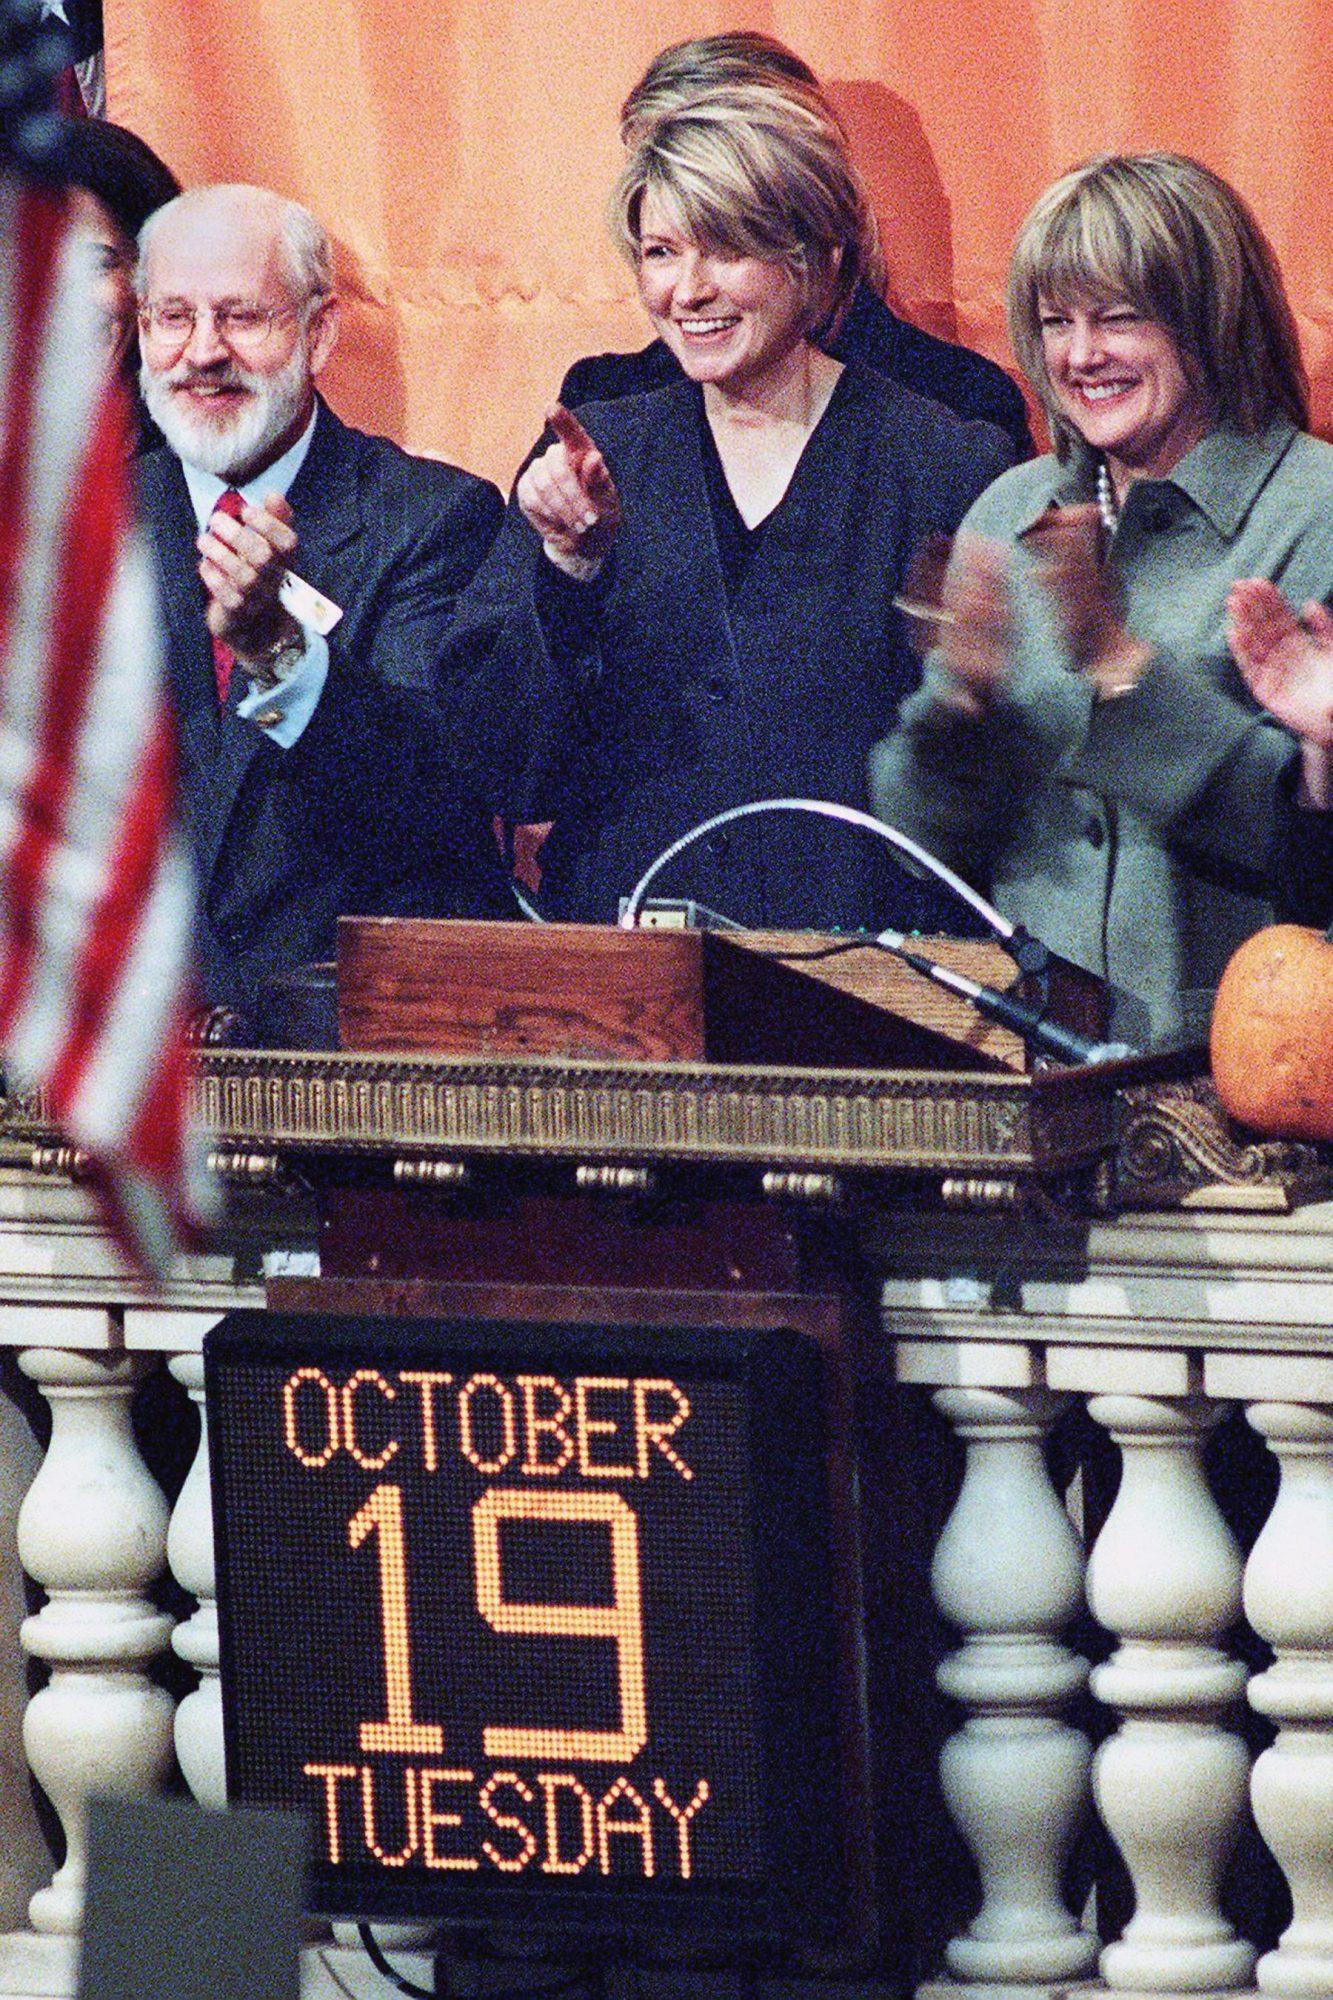 Martha Stewart (C), who heads the Martha Stewart L